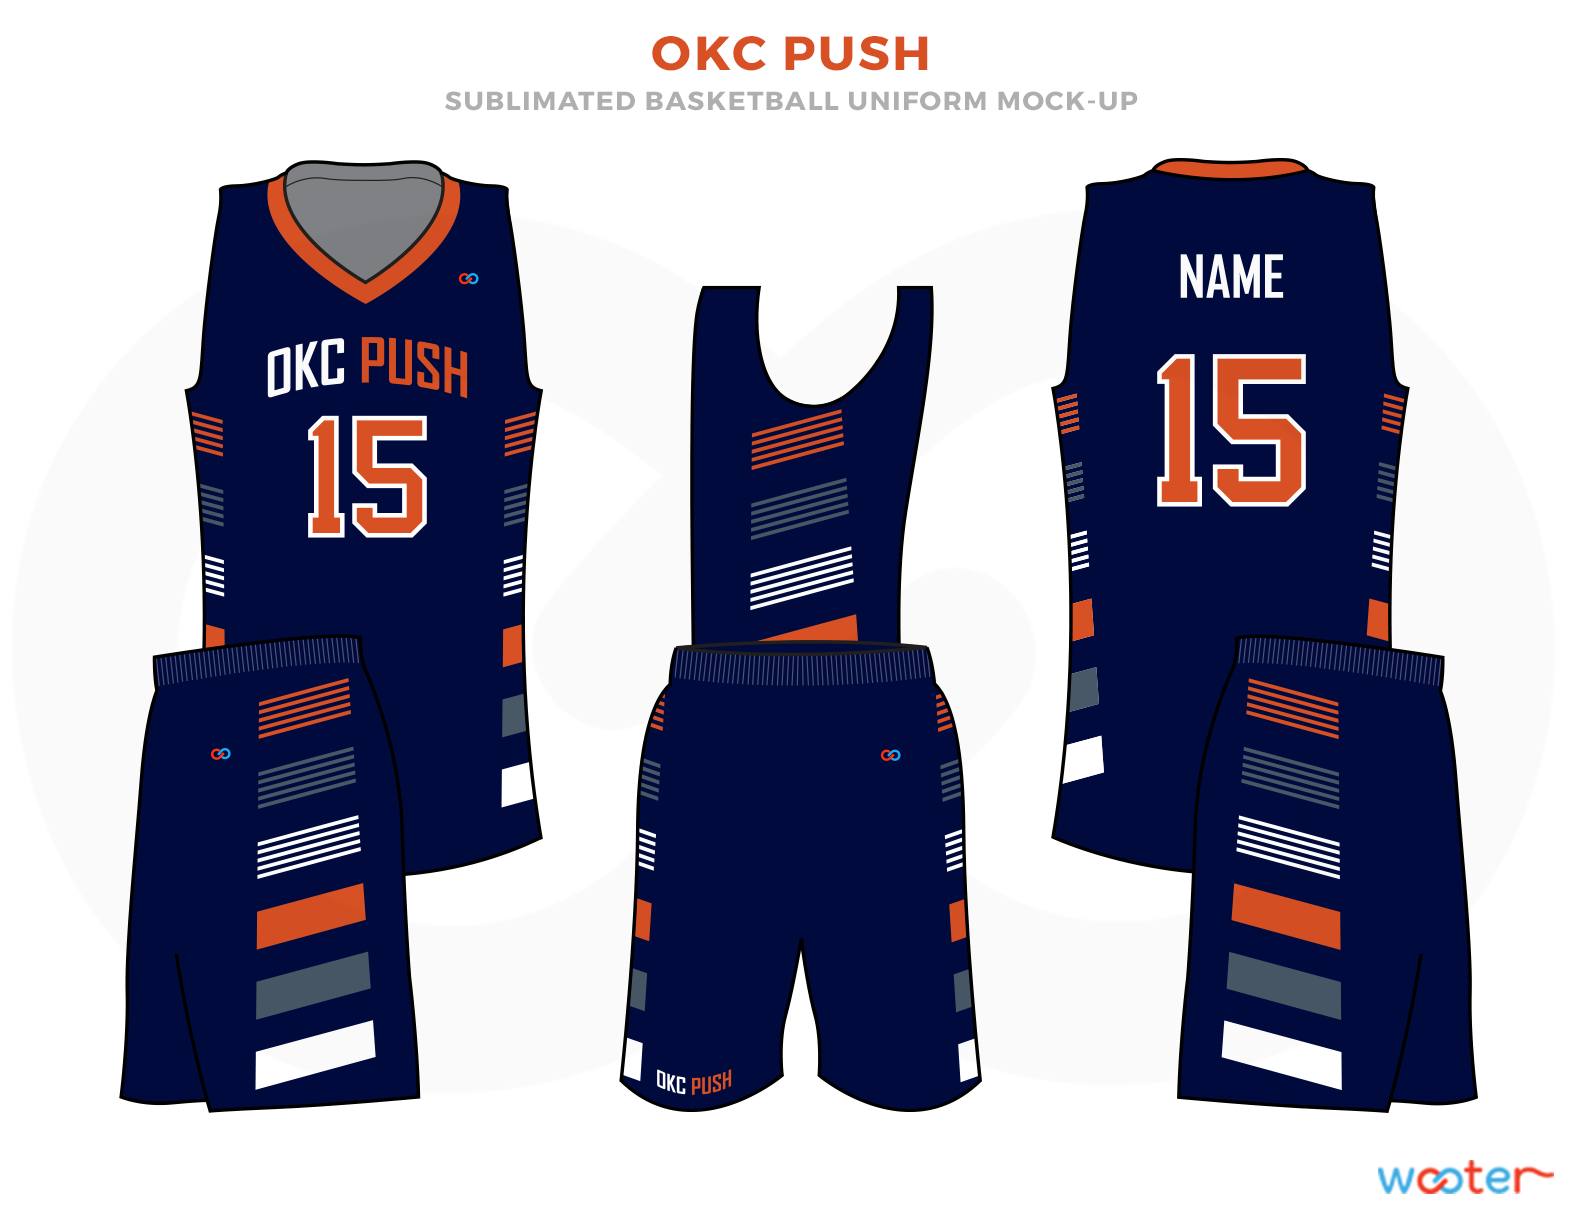 OKC PUSH Blue Pink Orange and White Basketball Uniforms, Jersey and Shorts